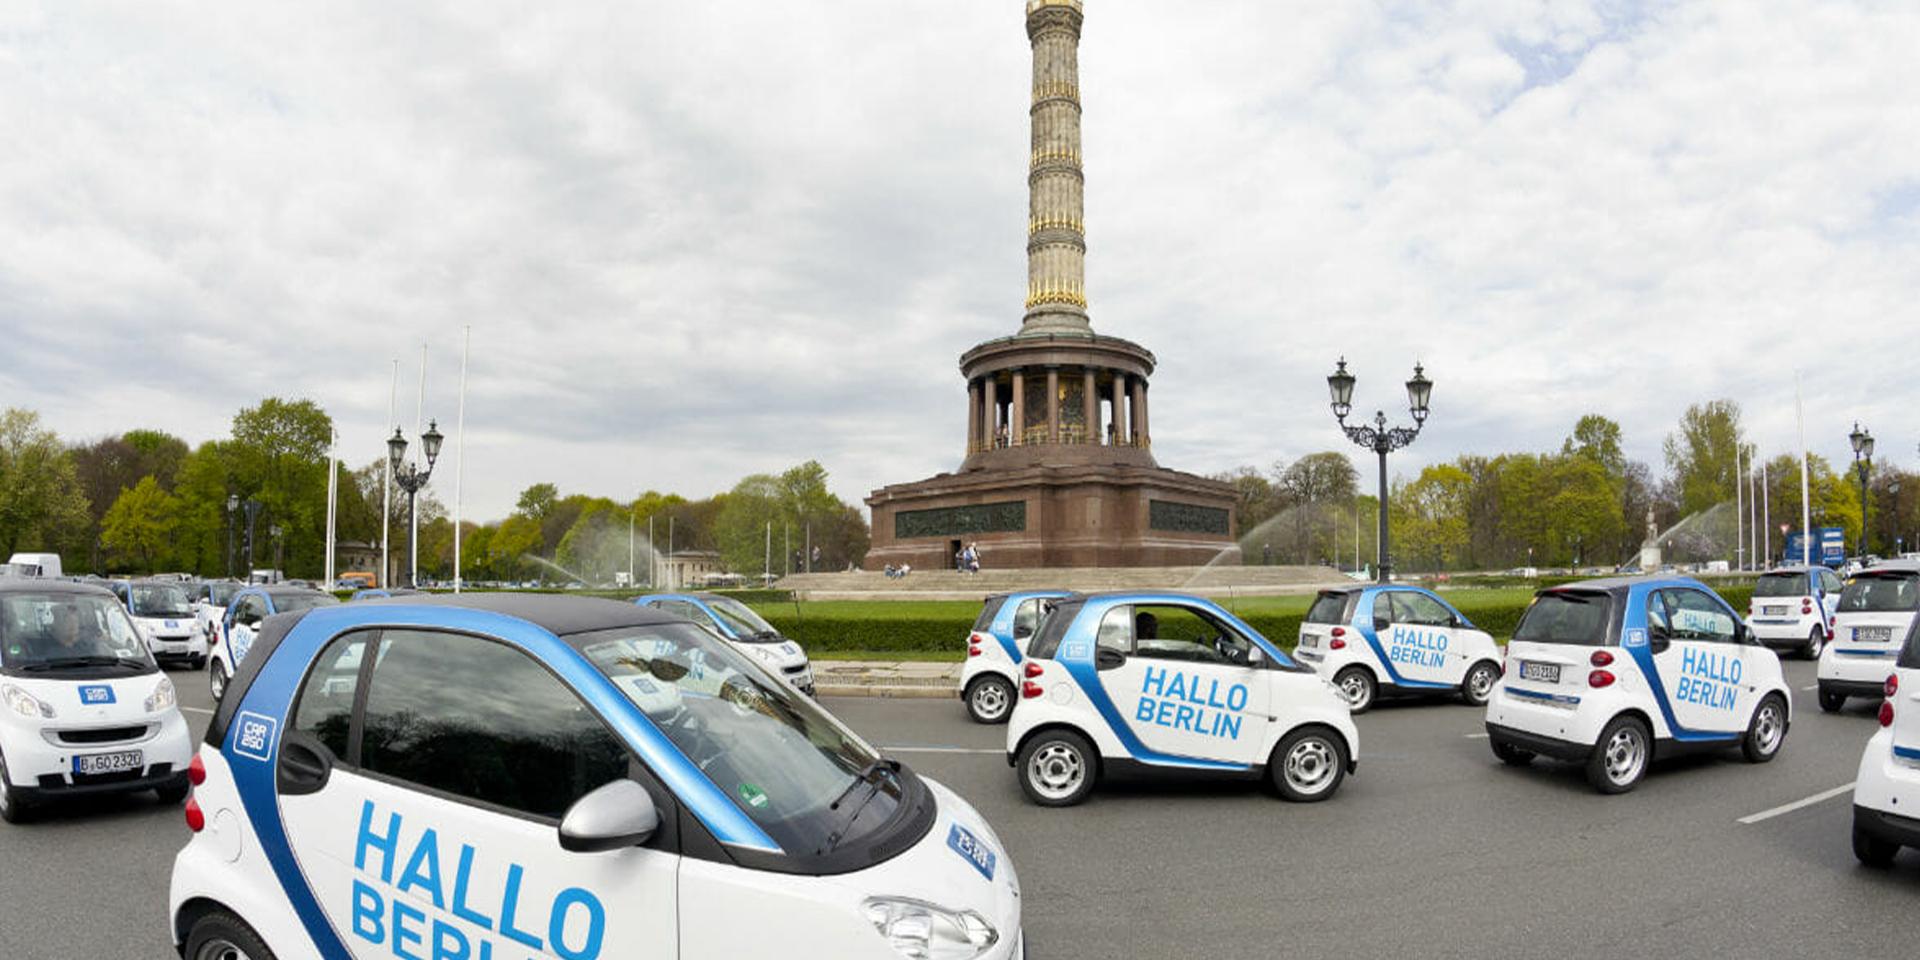 car2go – Launchkampagne - Markenbildung & Positionierung